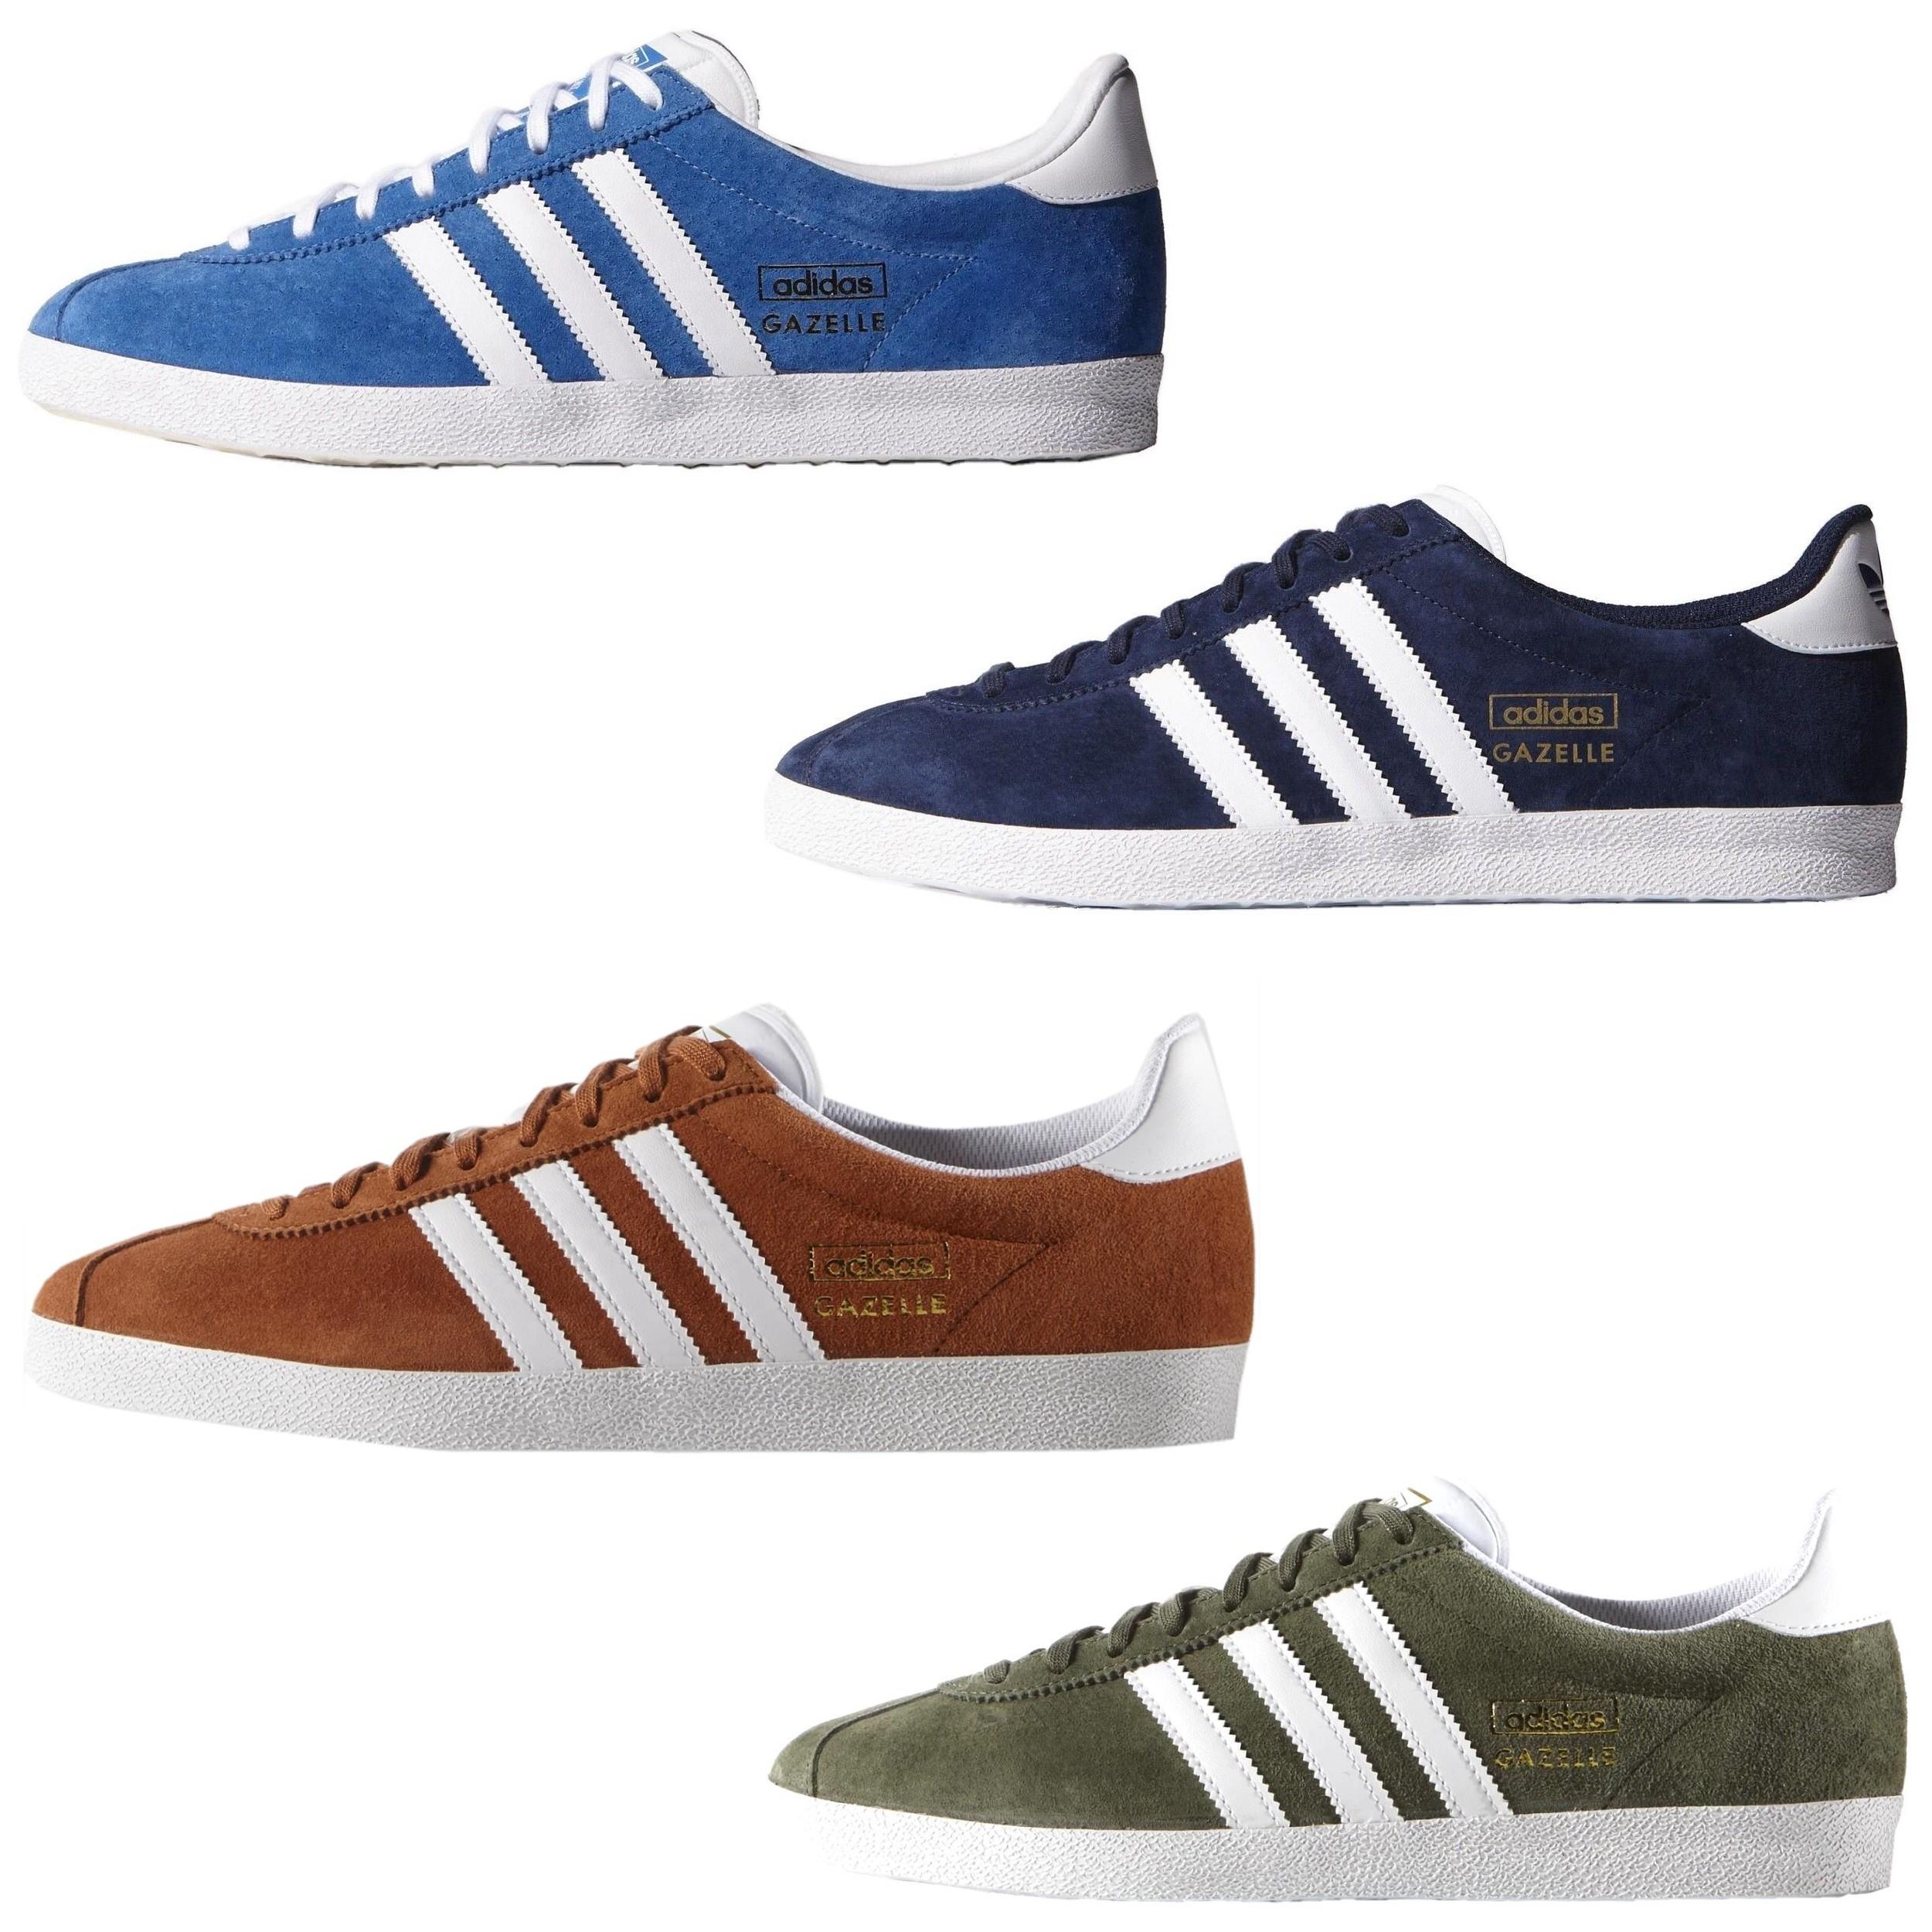 Adidas Gazelle Herren Schwarz